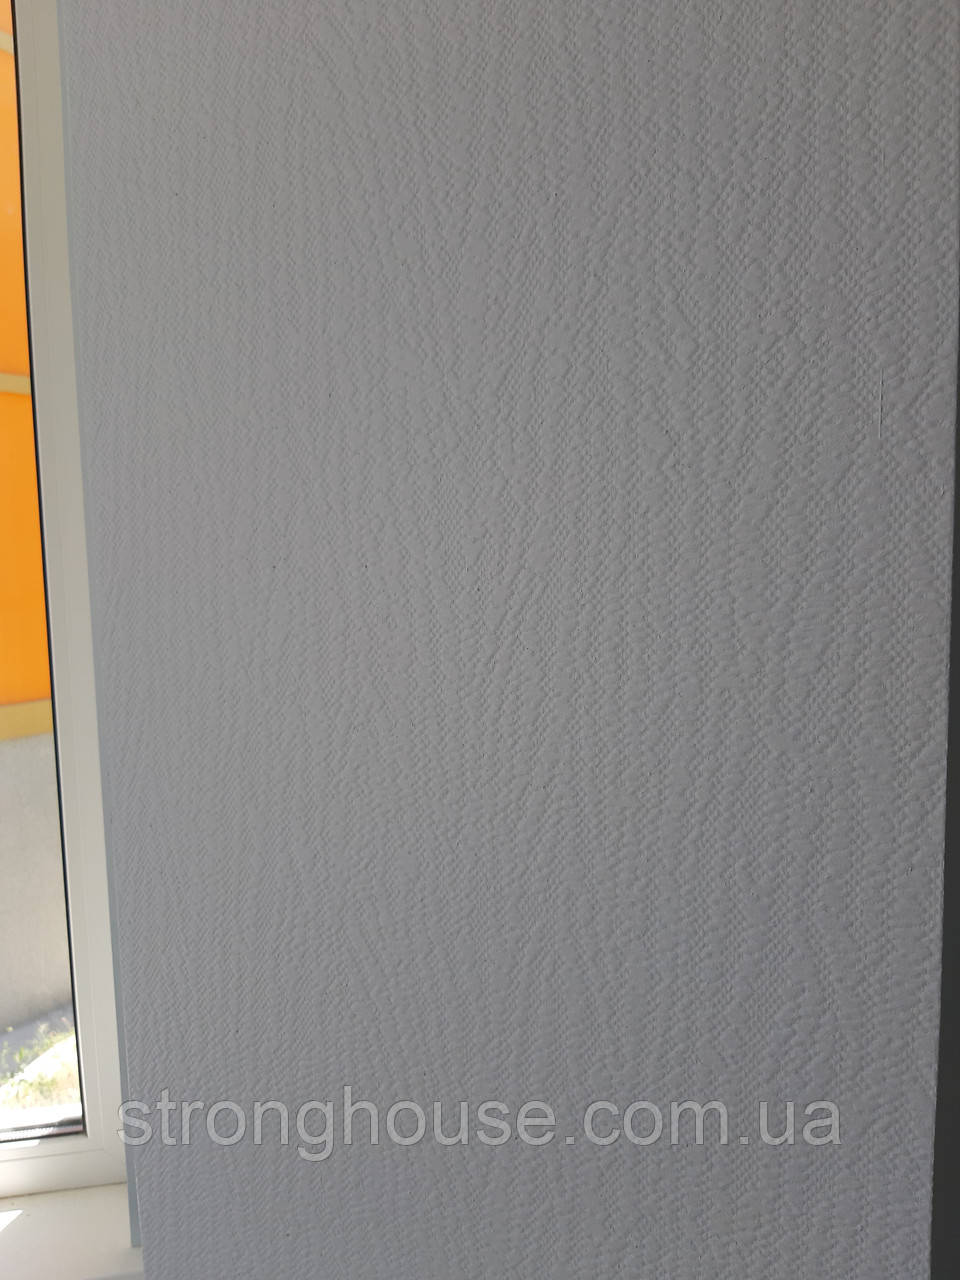 "Кора WD851 Обои стеклотканевые стеклообои ""Wellton Decor"" (Велтон Декор) new WD851"